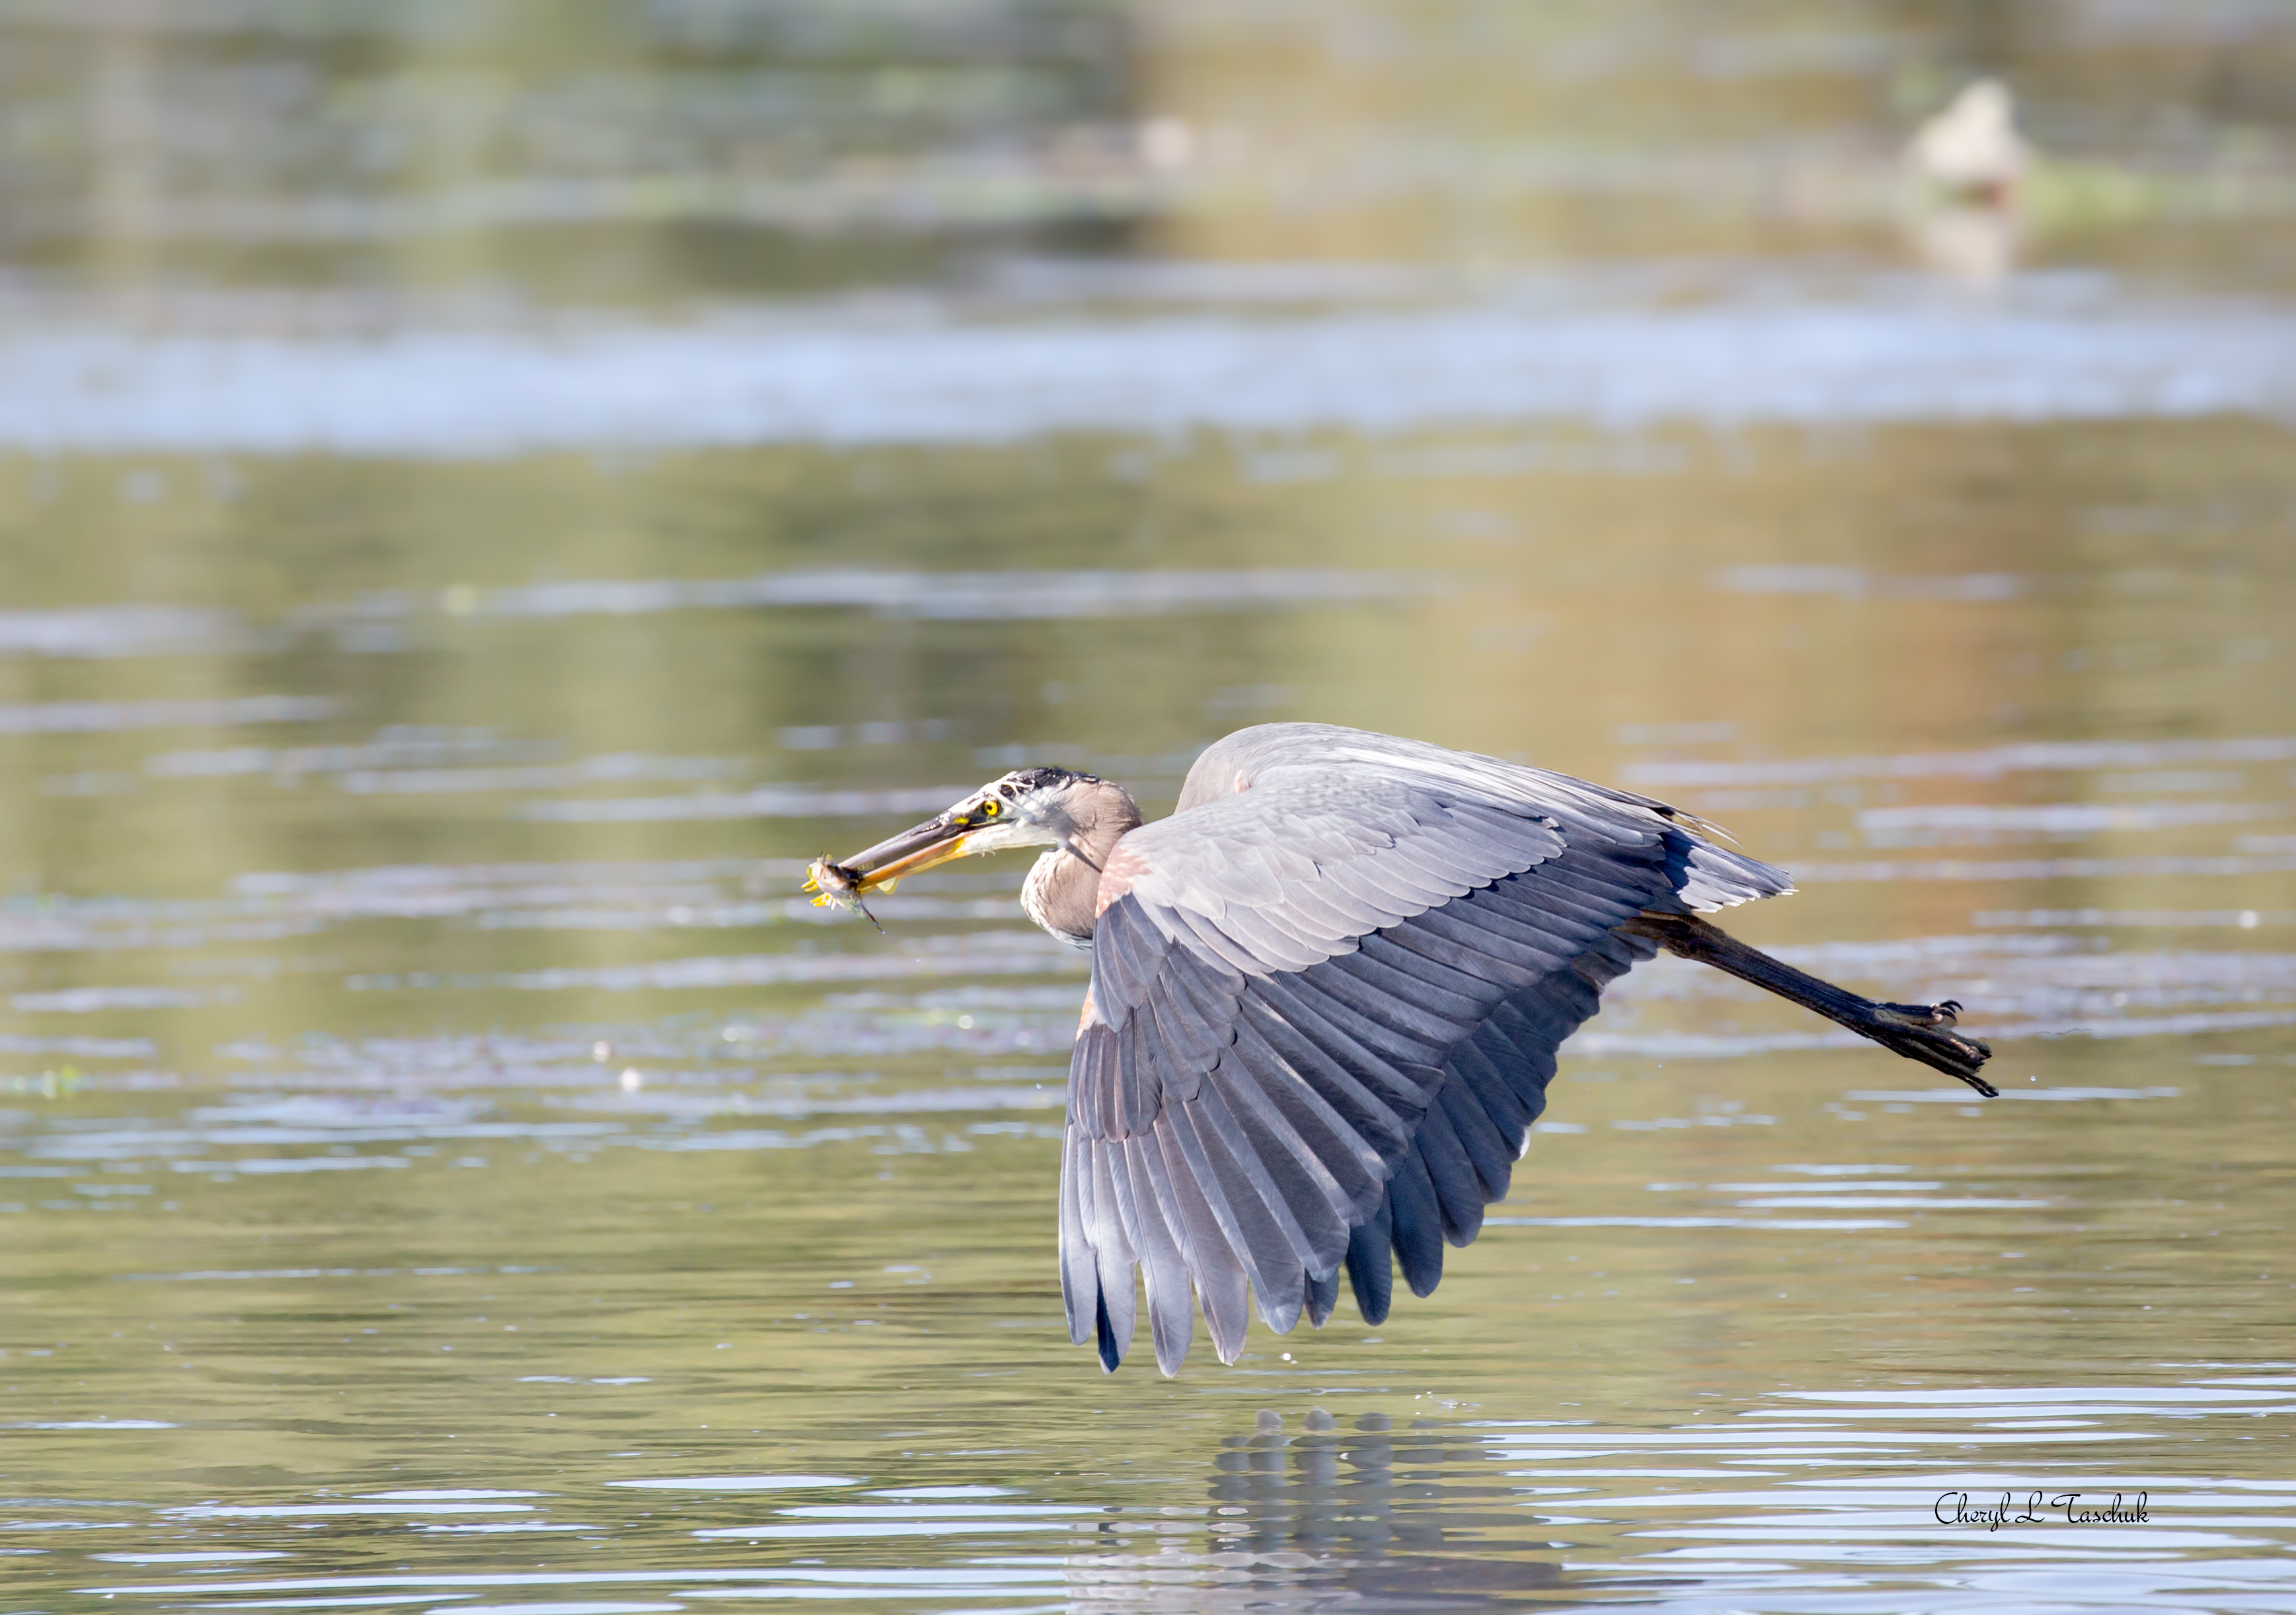 BI-Heron in Flight with Fish 6523d